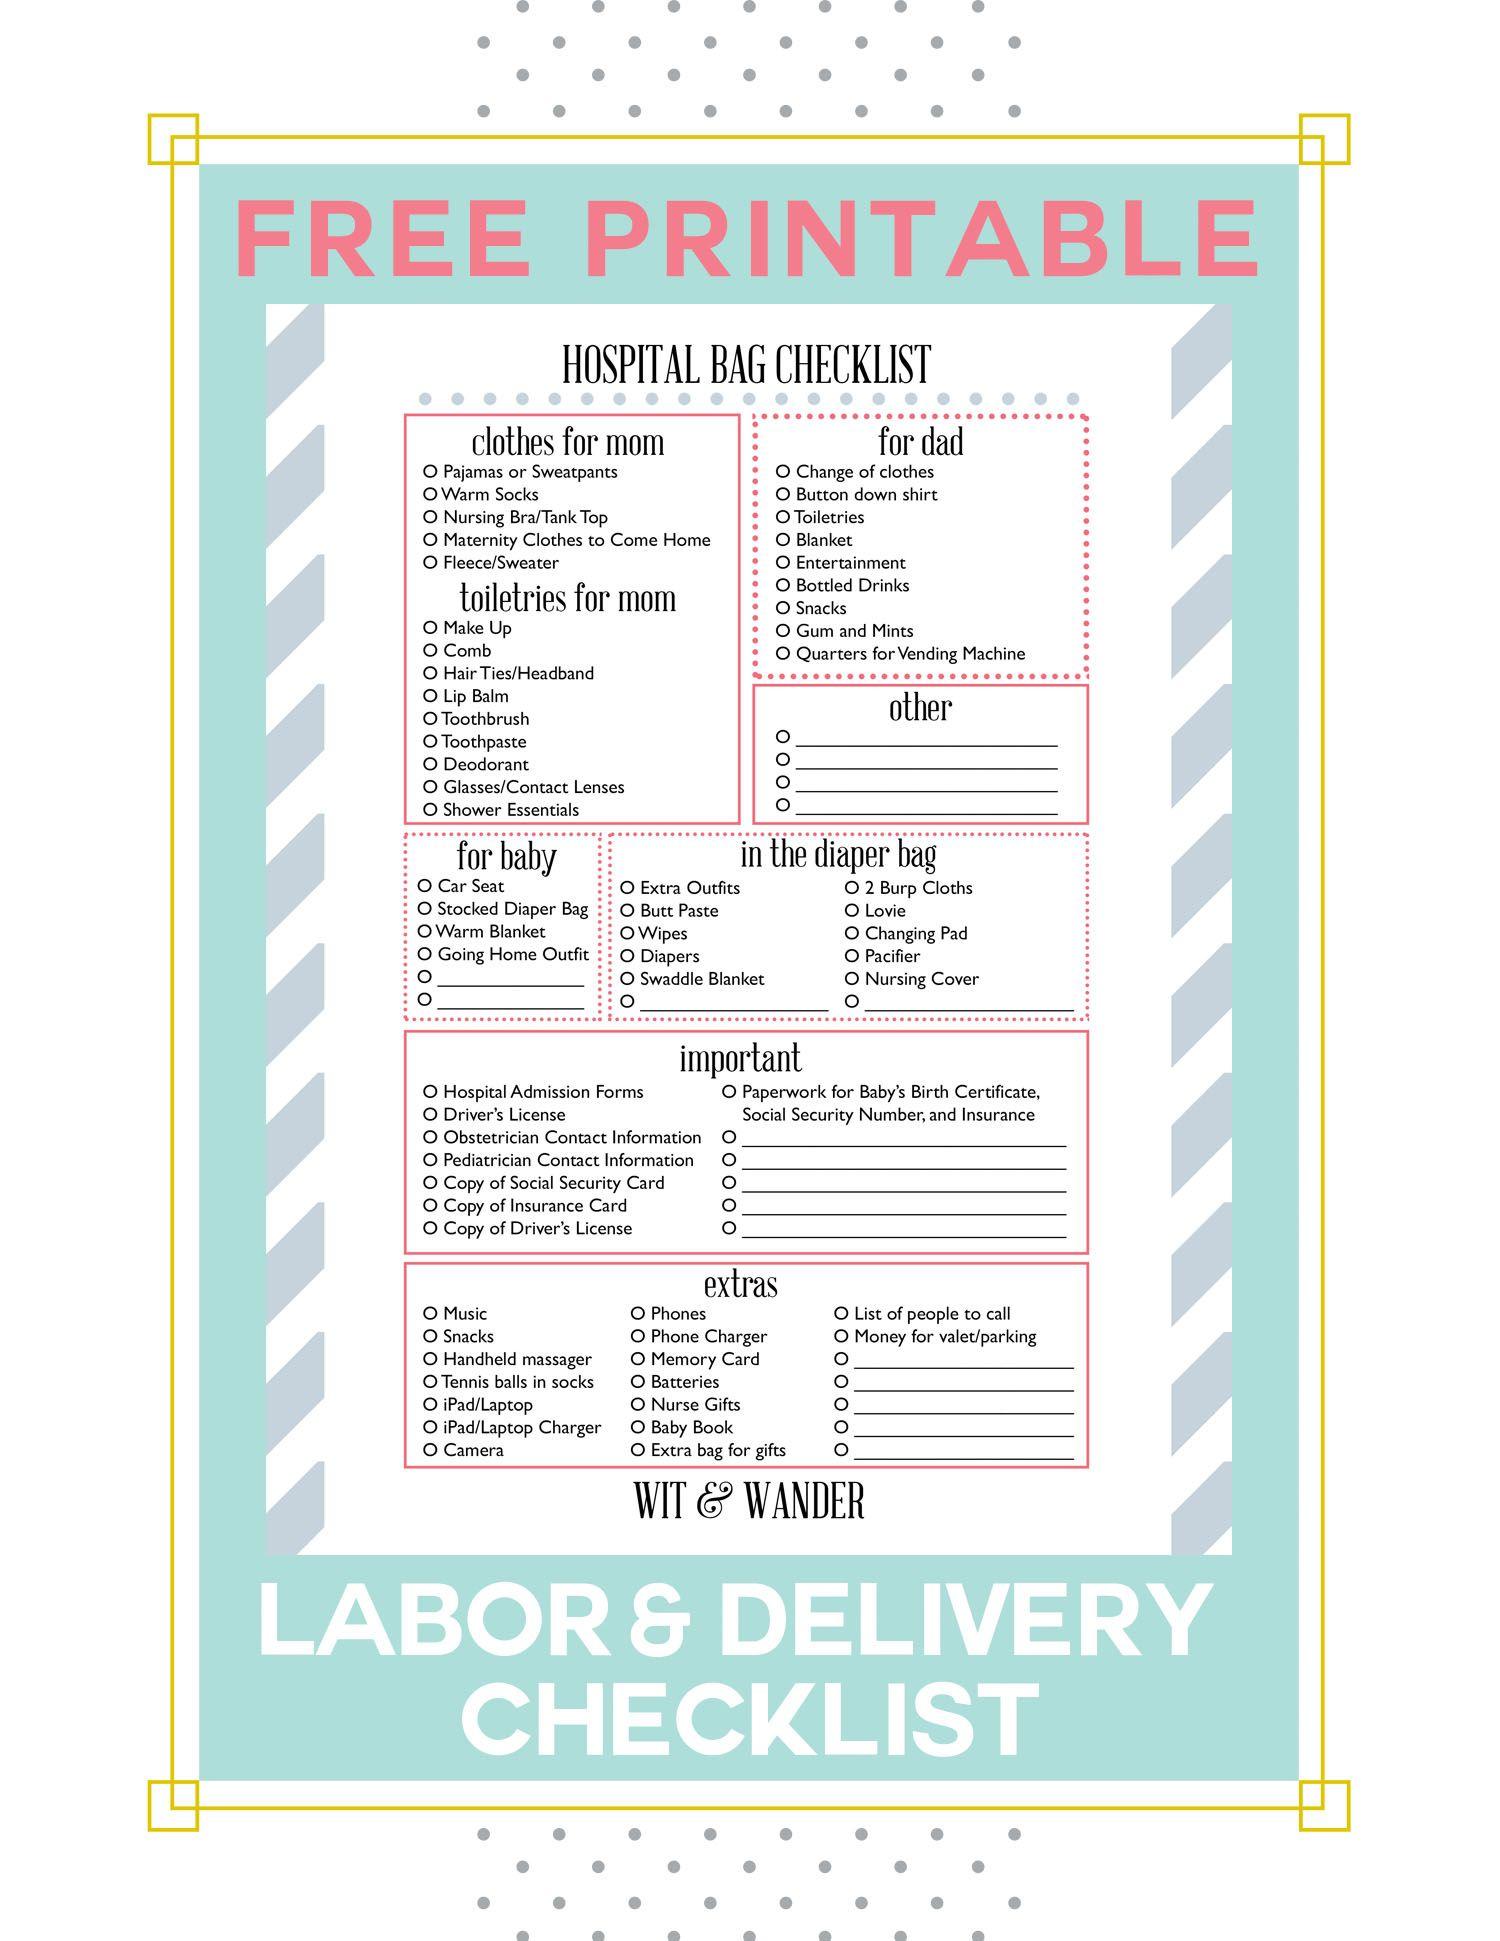 Printable Maternity Hospital Bag Checklist Wit Wander